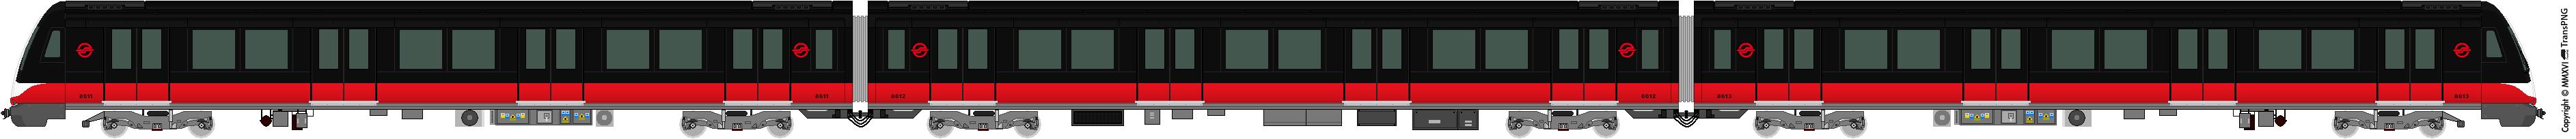 [5334] SMRT Trains 5334